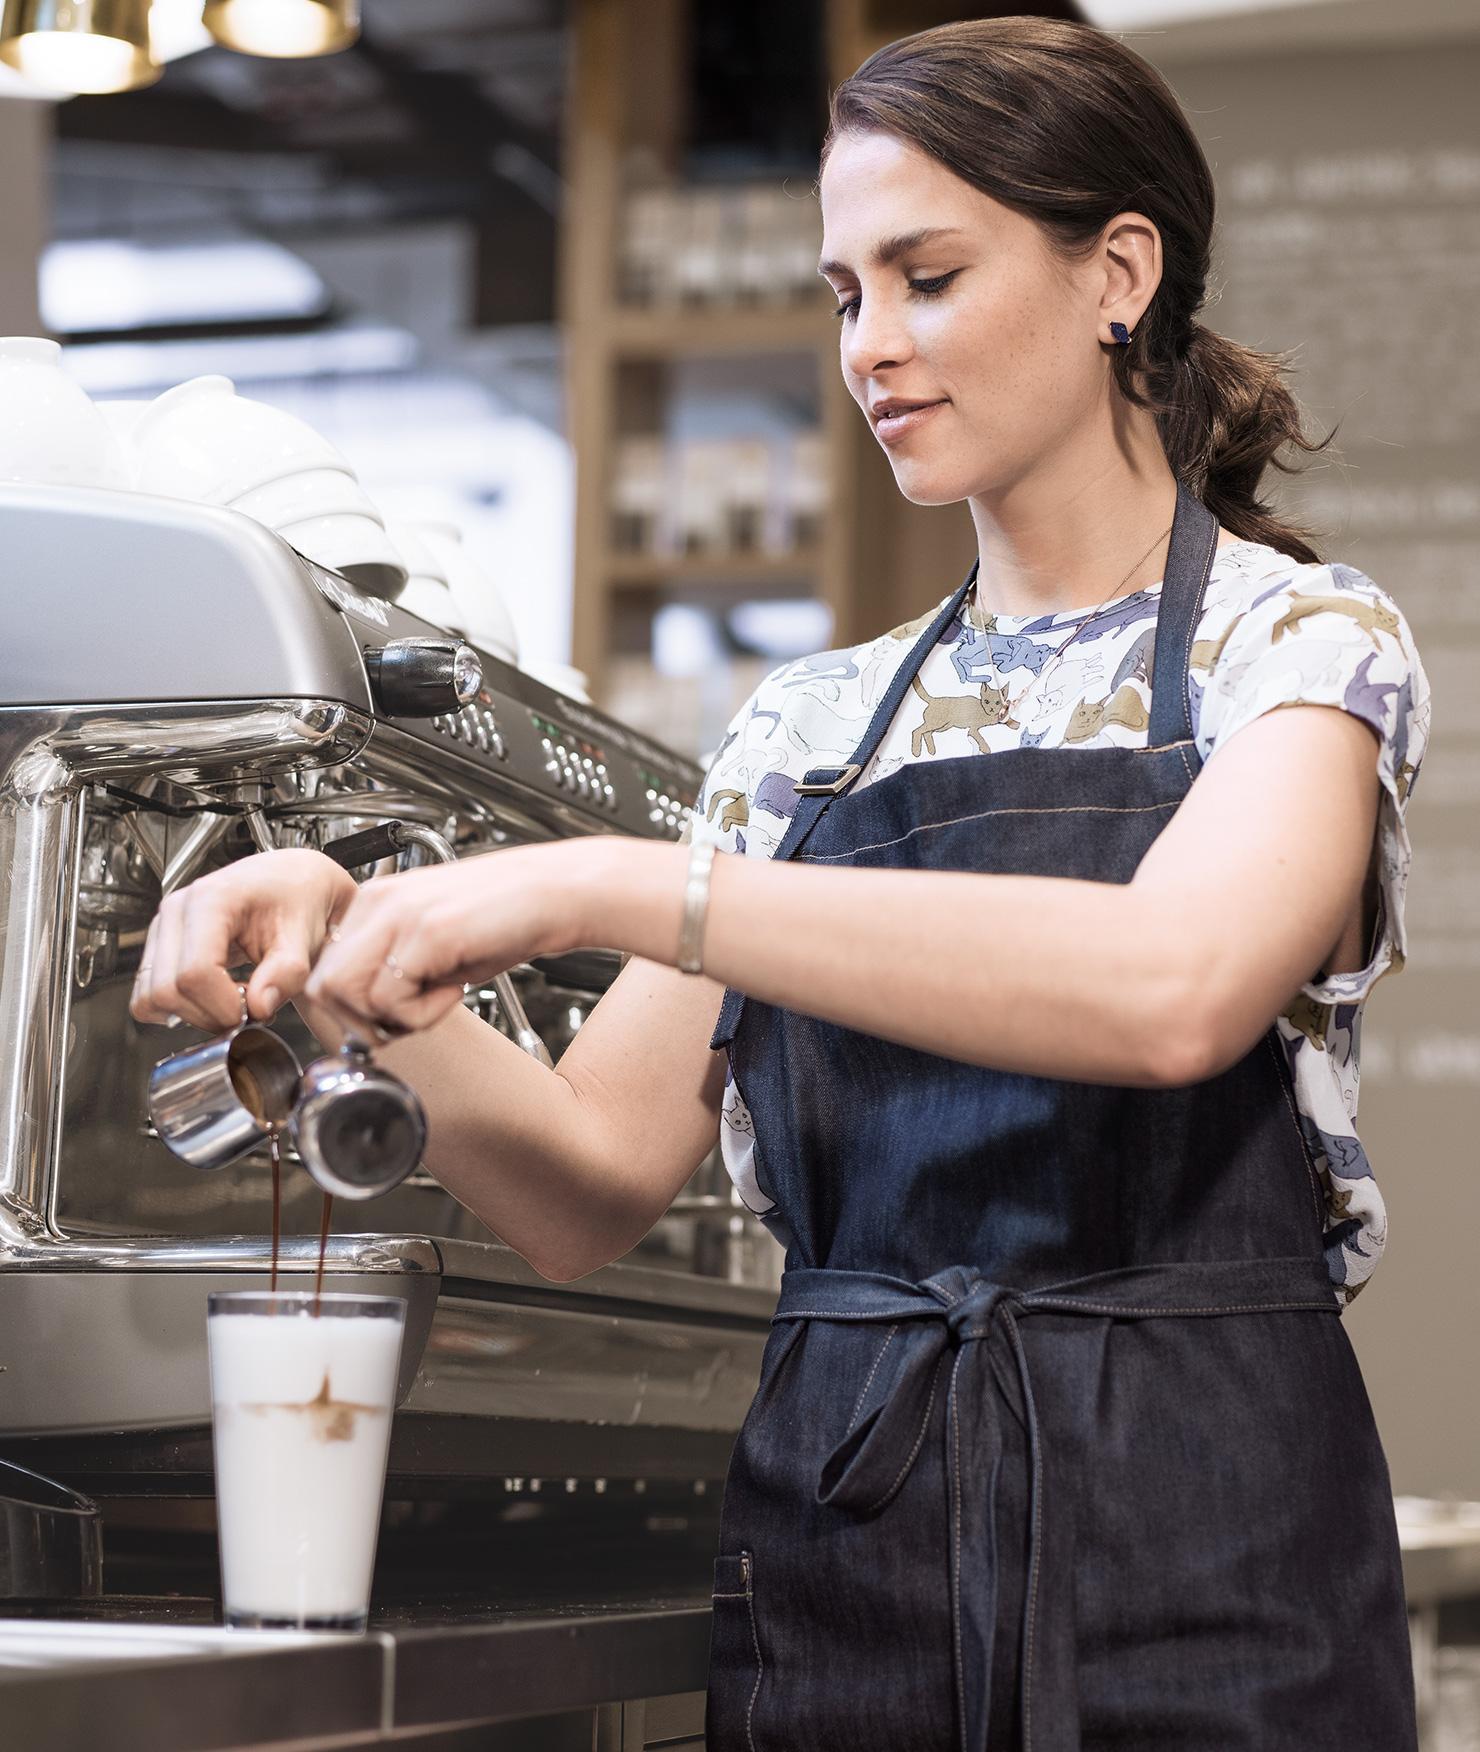 BRITA Filter AquaAroma Crema Kaffee Barista